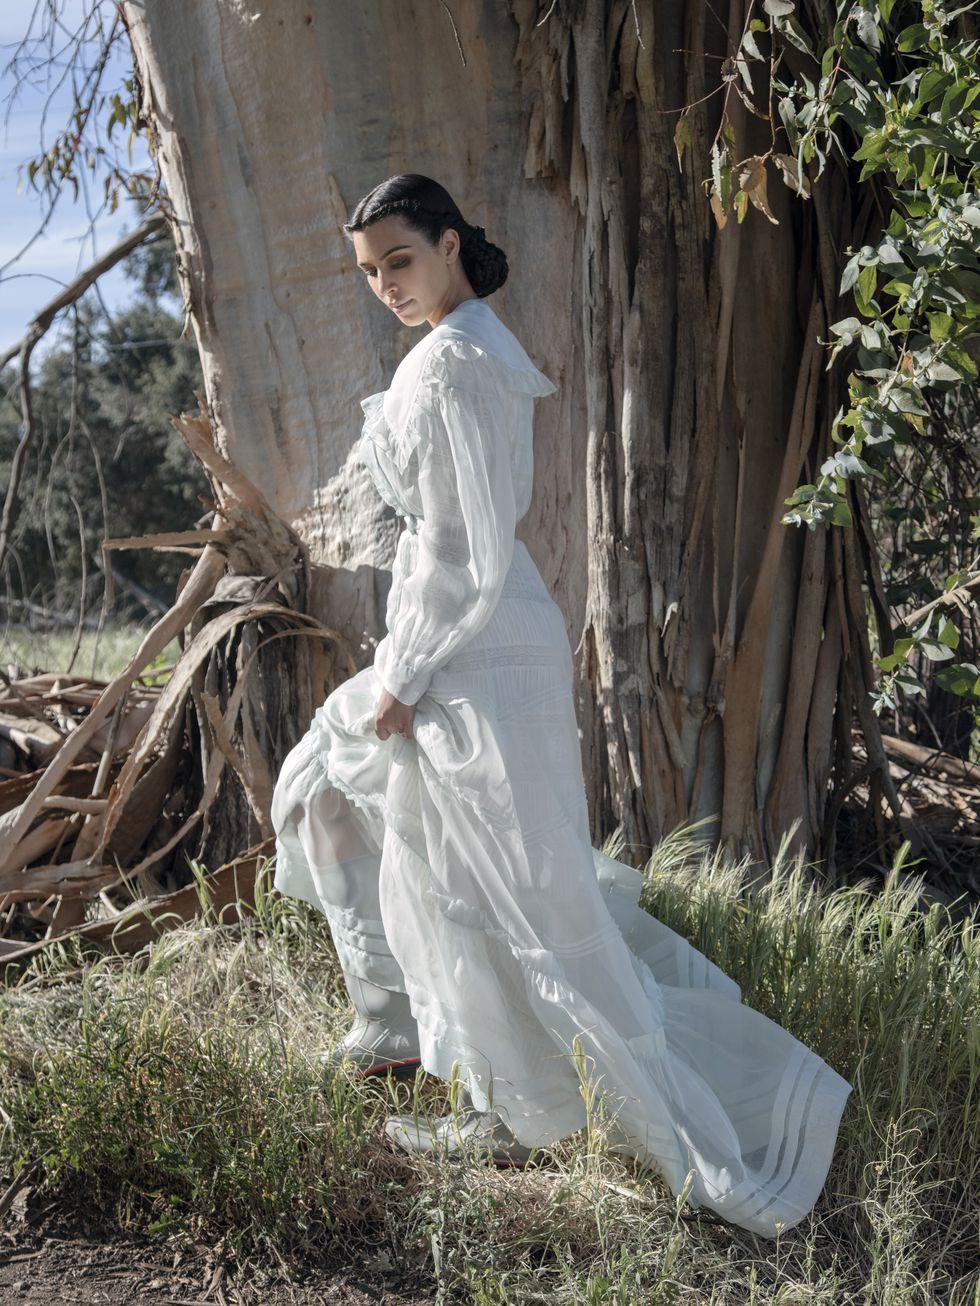 Kim Kardashian West by Jackie Nickerson for CR Fashion Book 13 (8).jpg